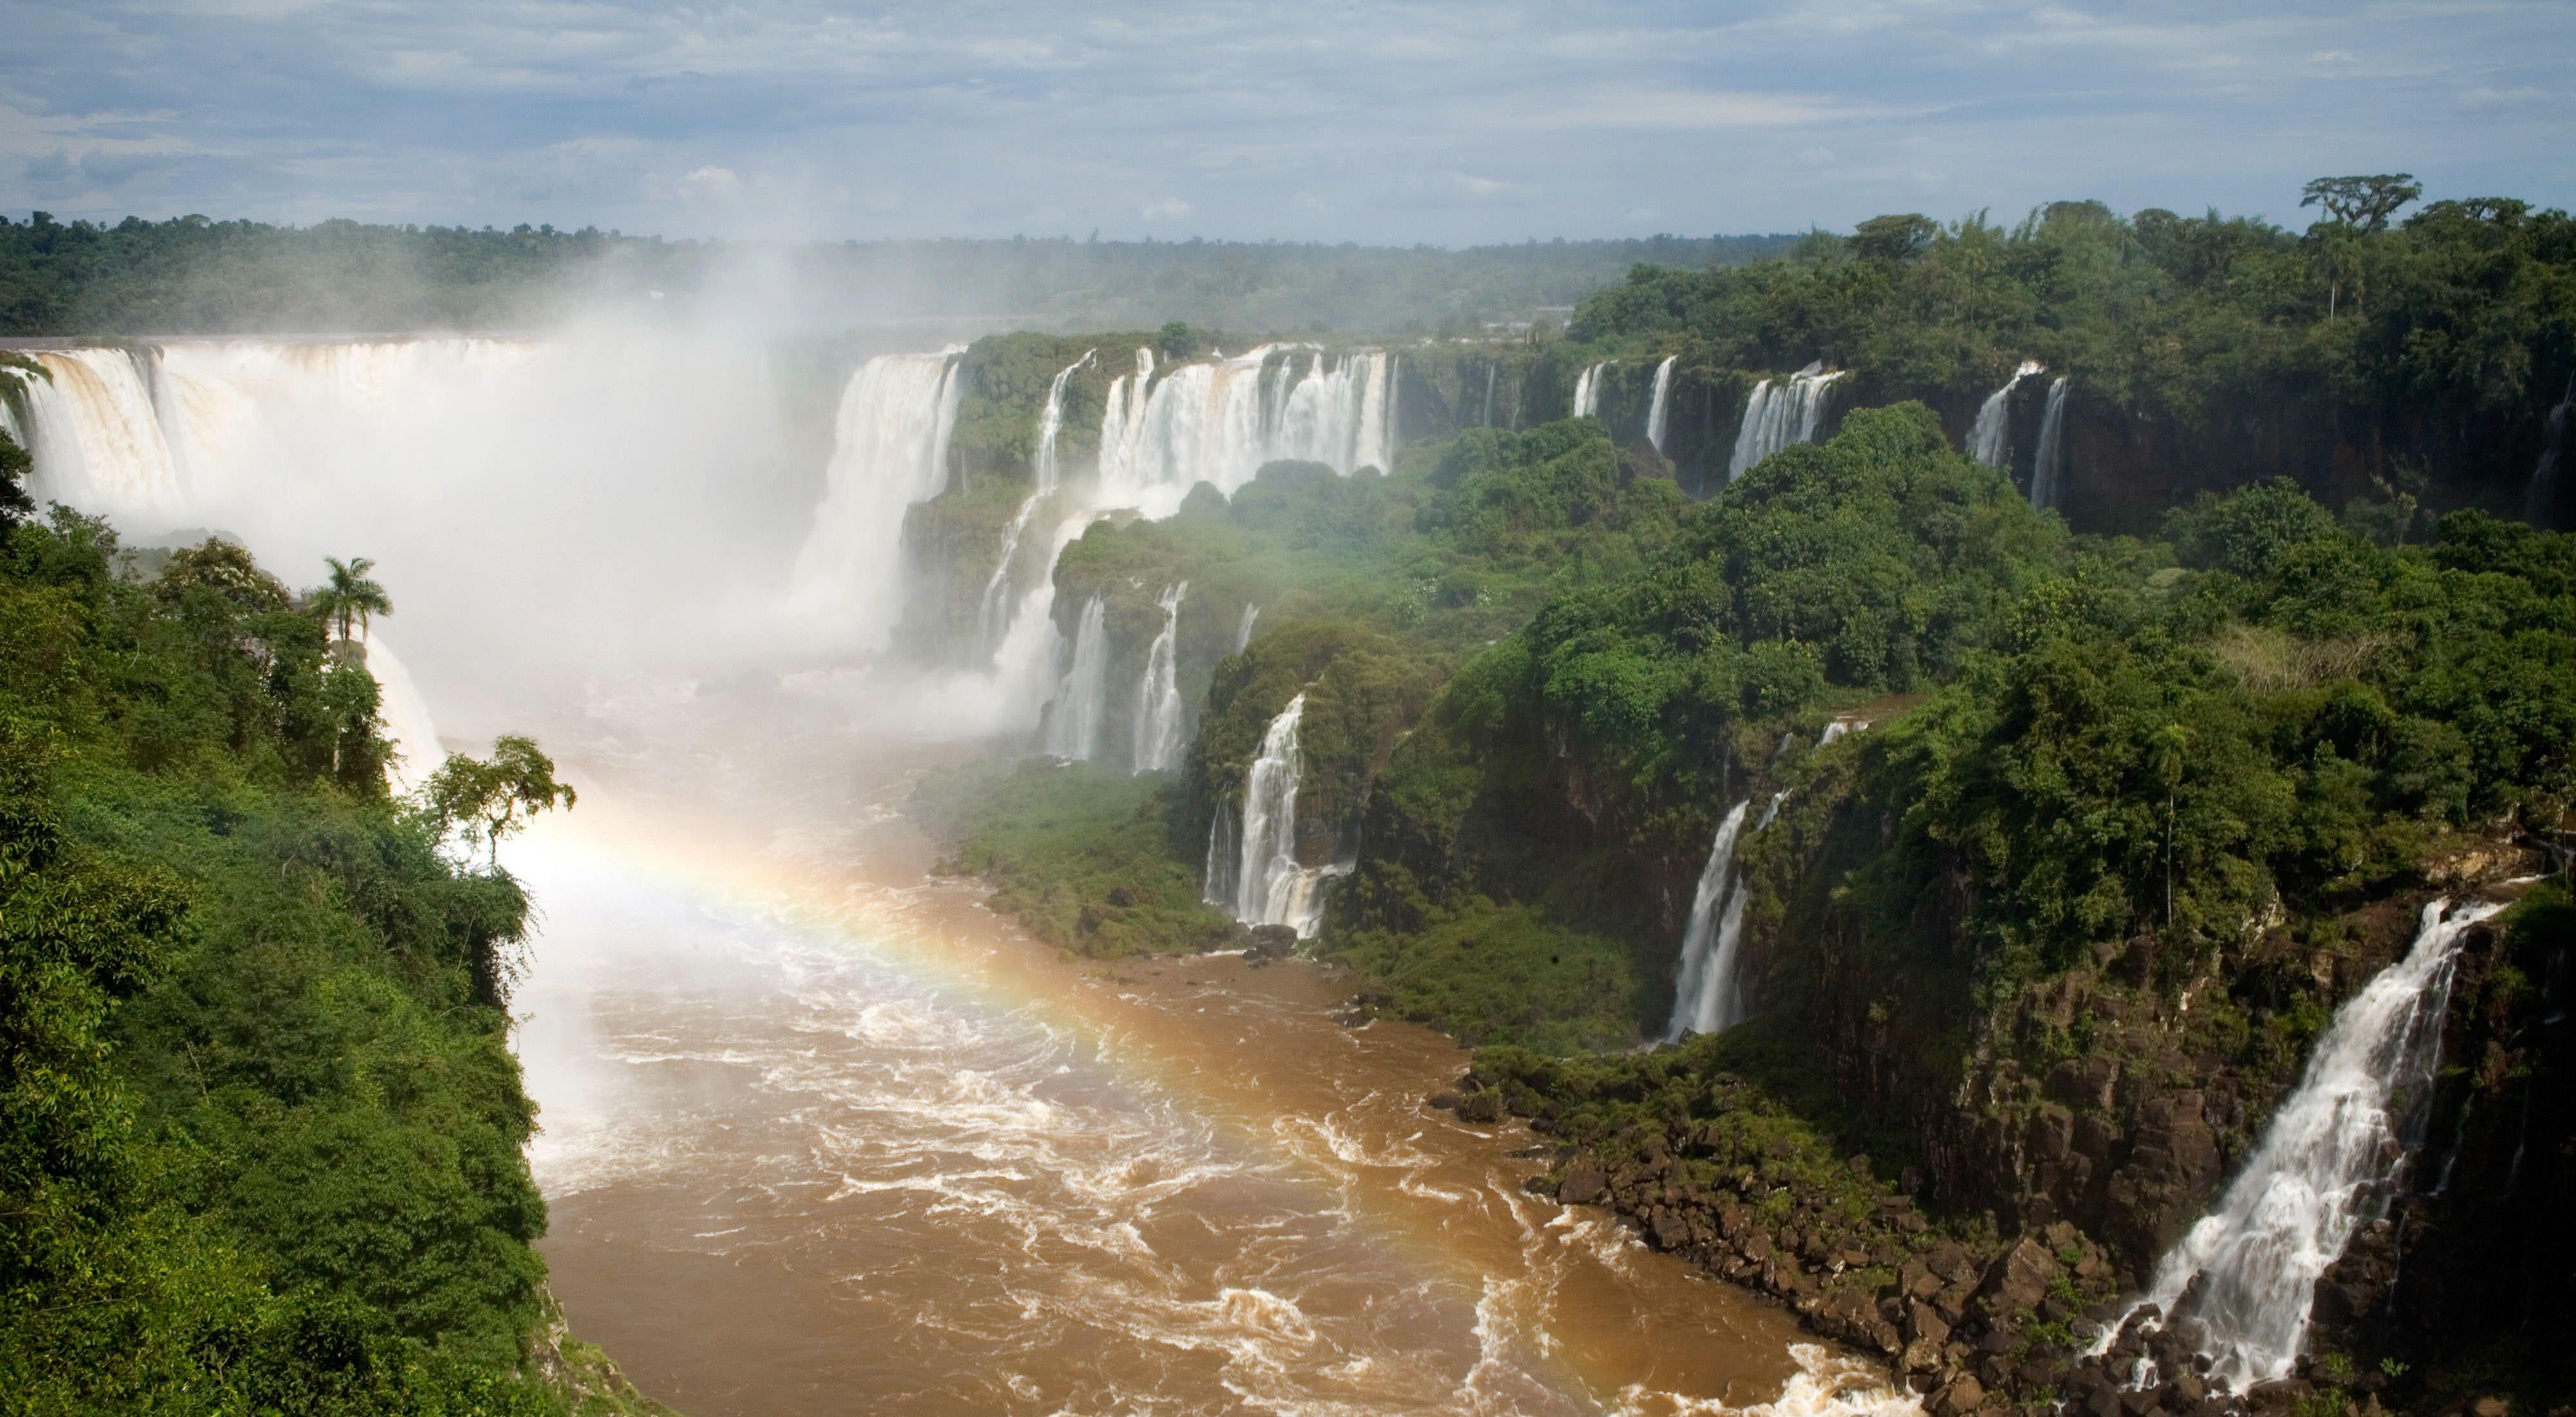 Waterfalls at Iguaçu National Park, Brazil.